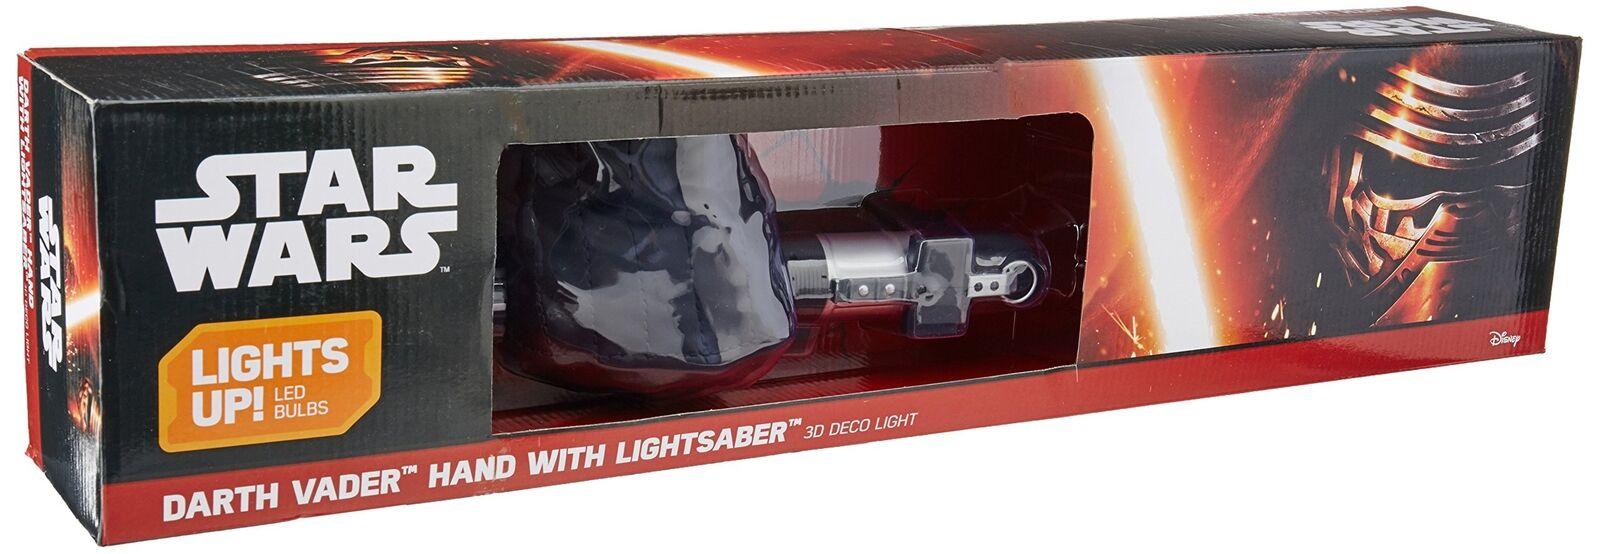 3DLightFX Marvel Darth Vader Hand with Light Saber 3D Deco LED Wall Light